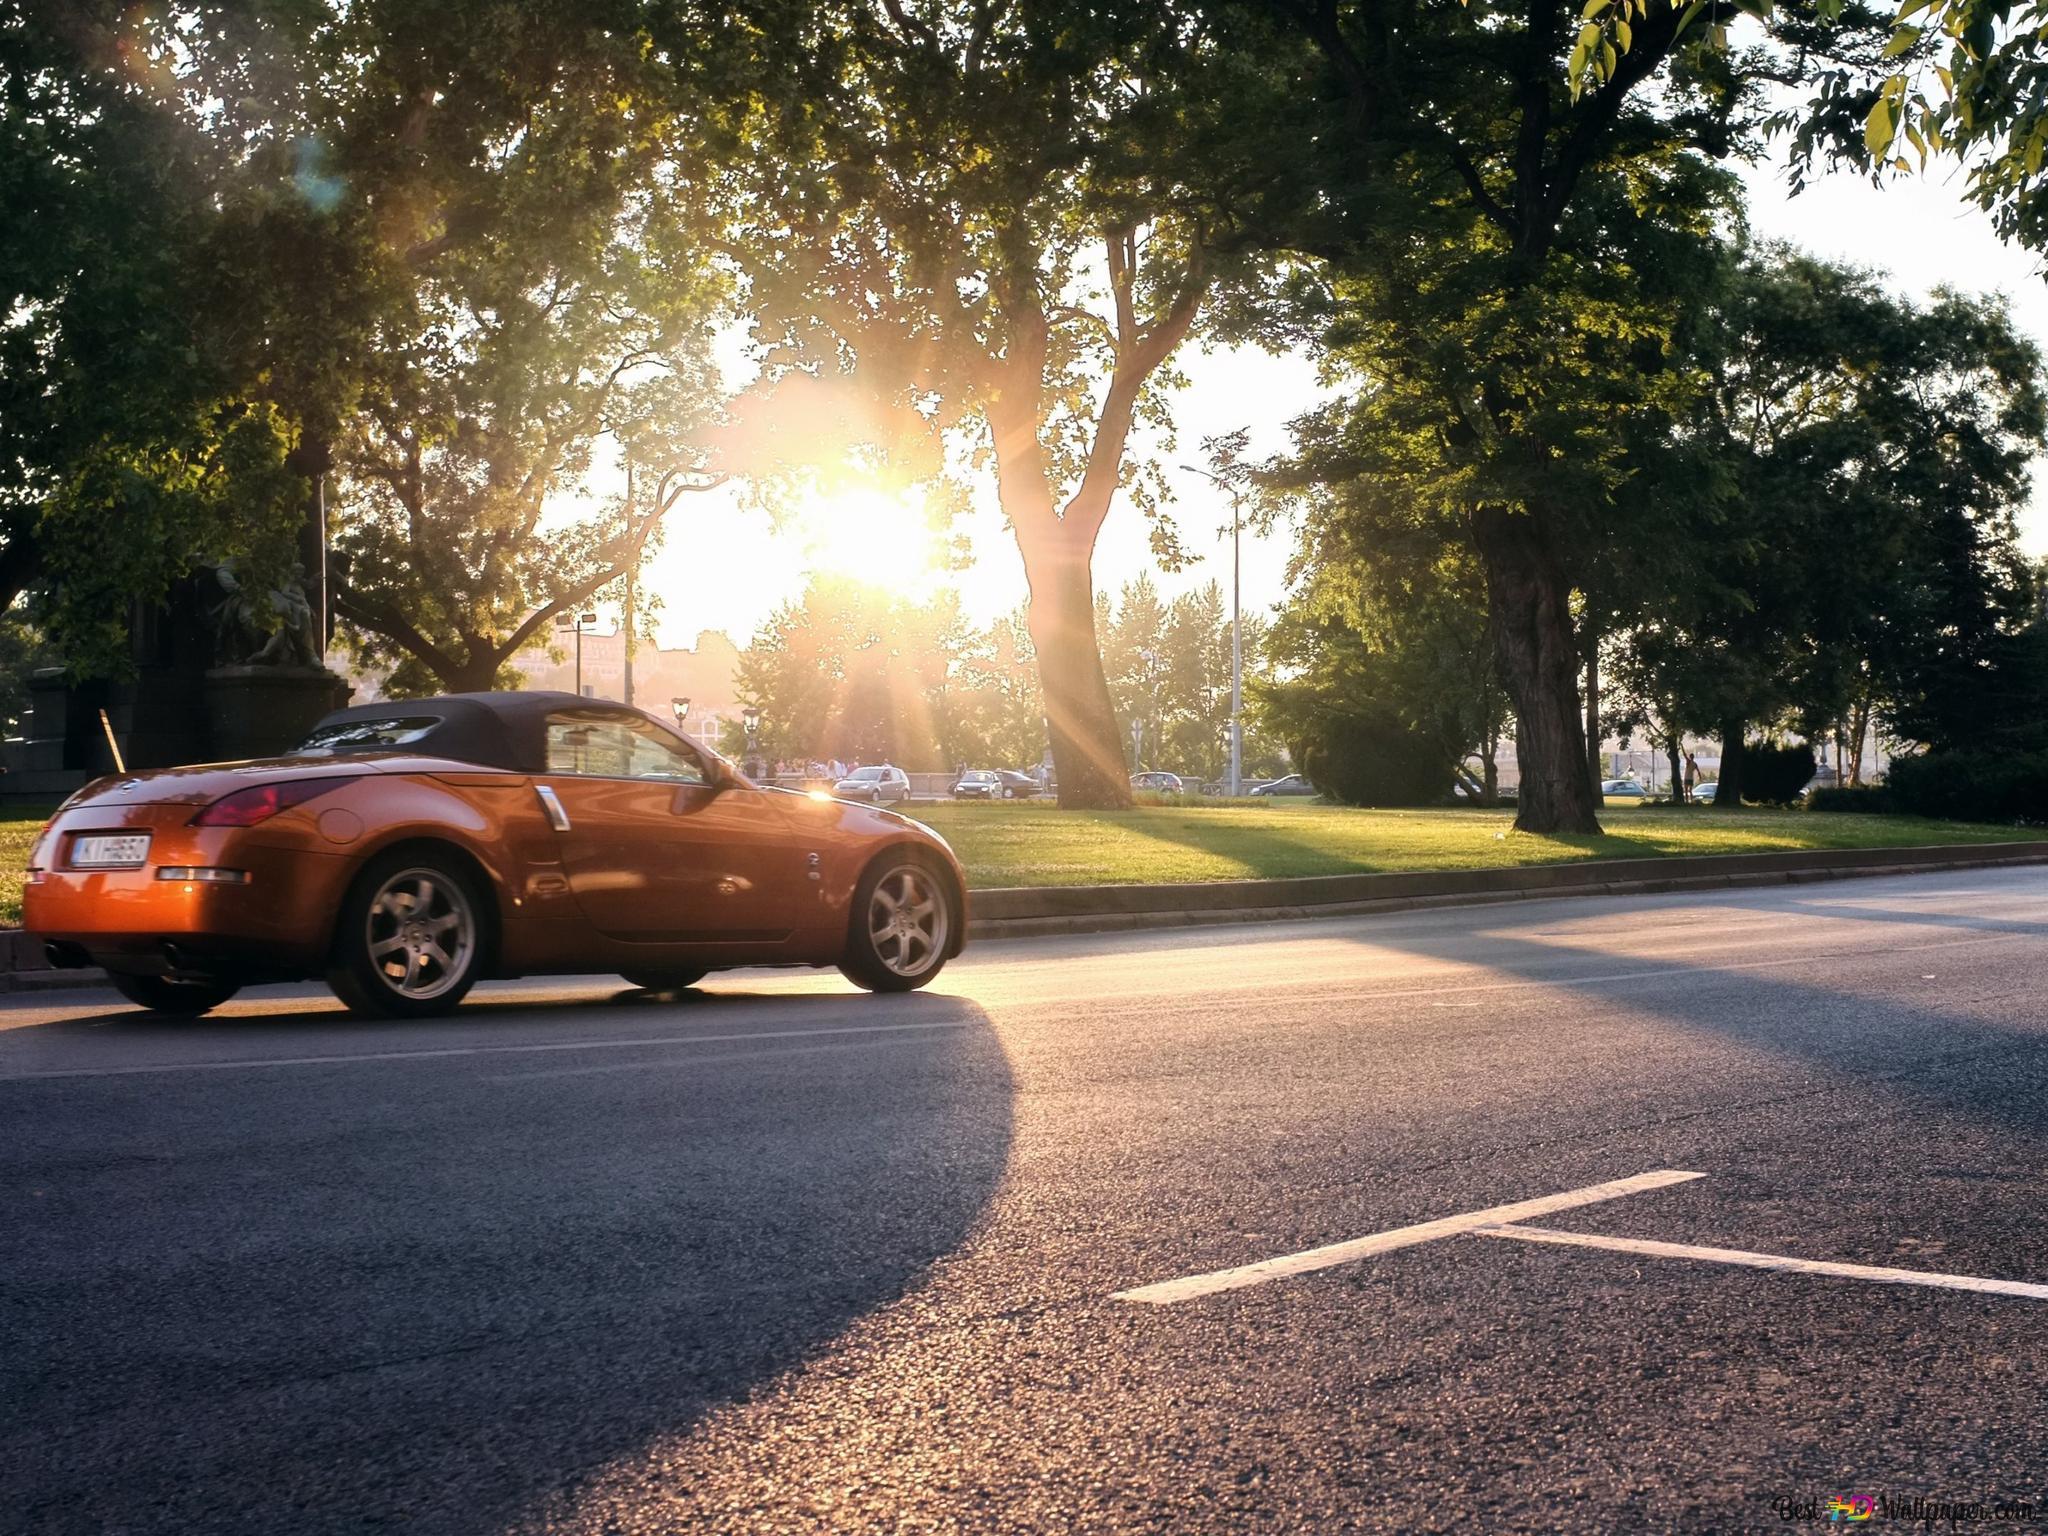 Orange Sports Car Hd Wallpaper Download